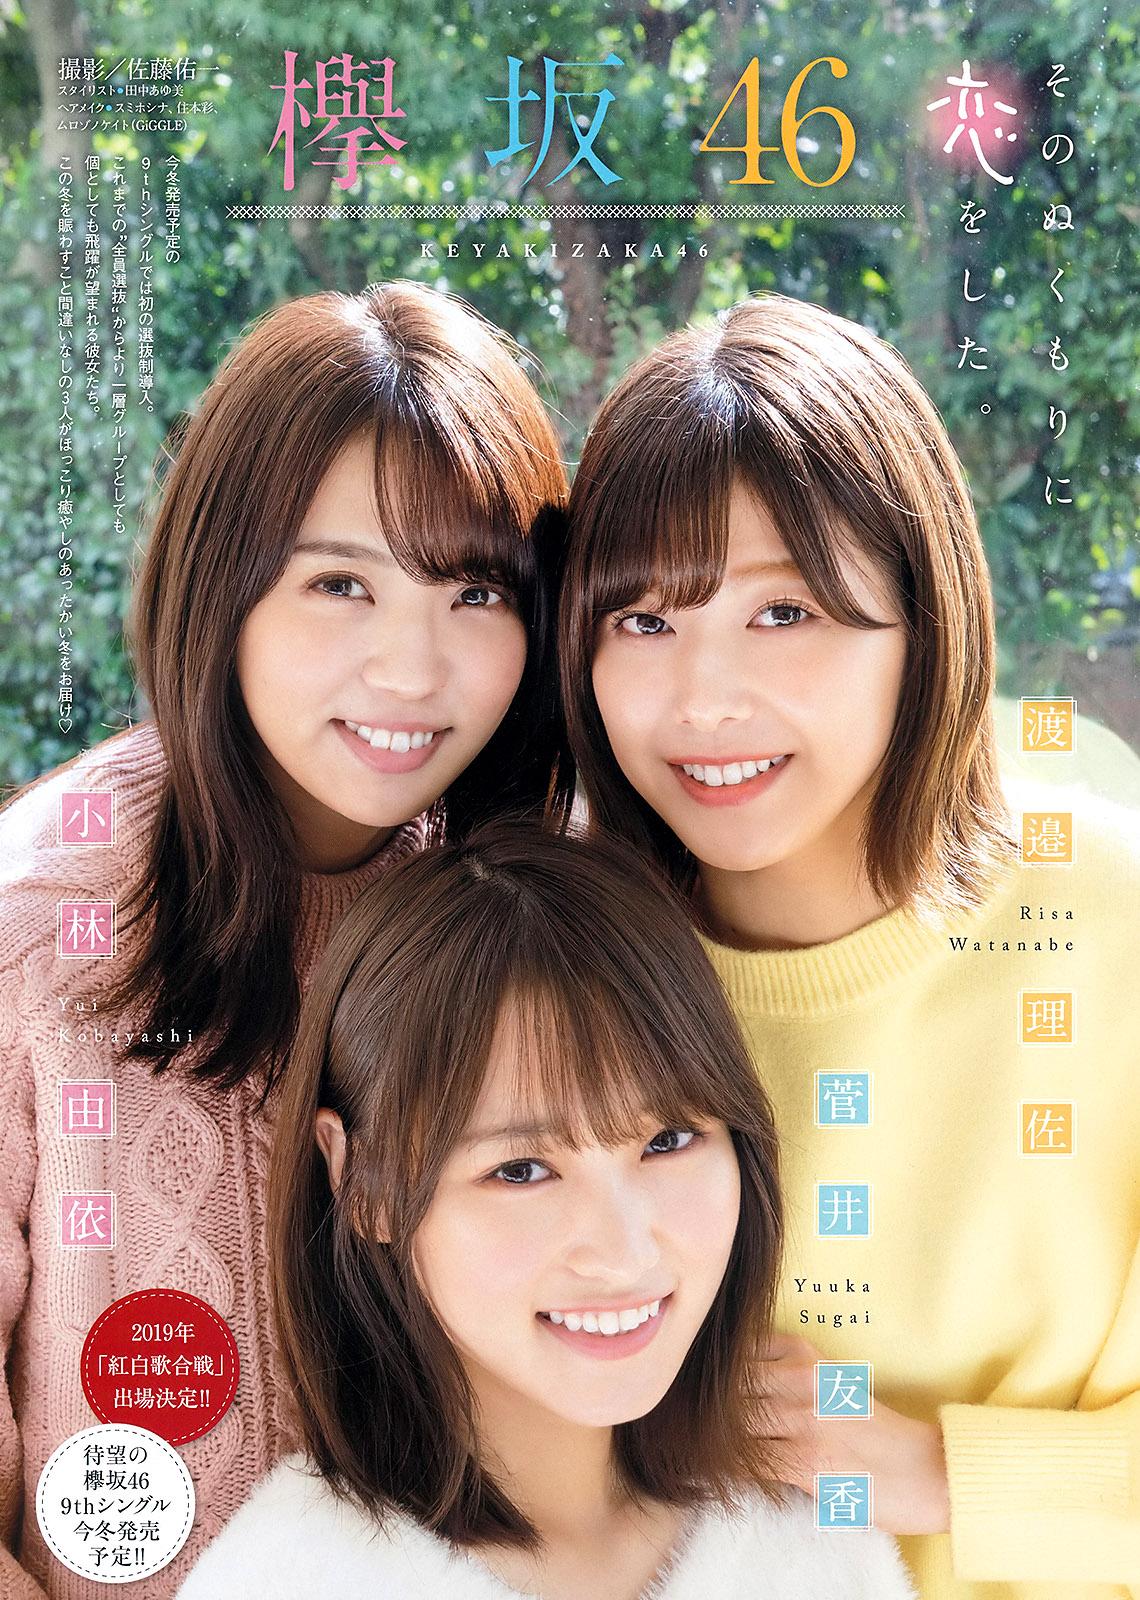 K46 Young Magazine 200101 02.jpg